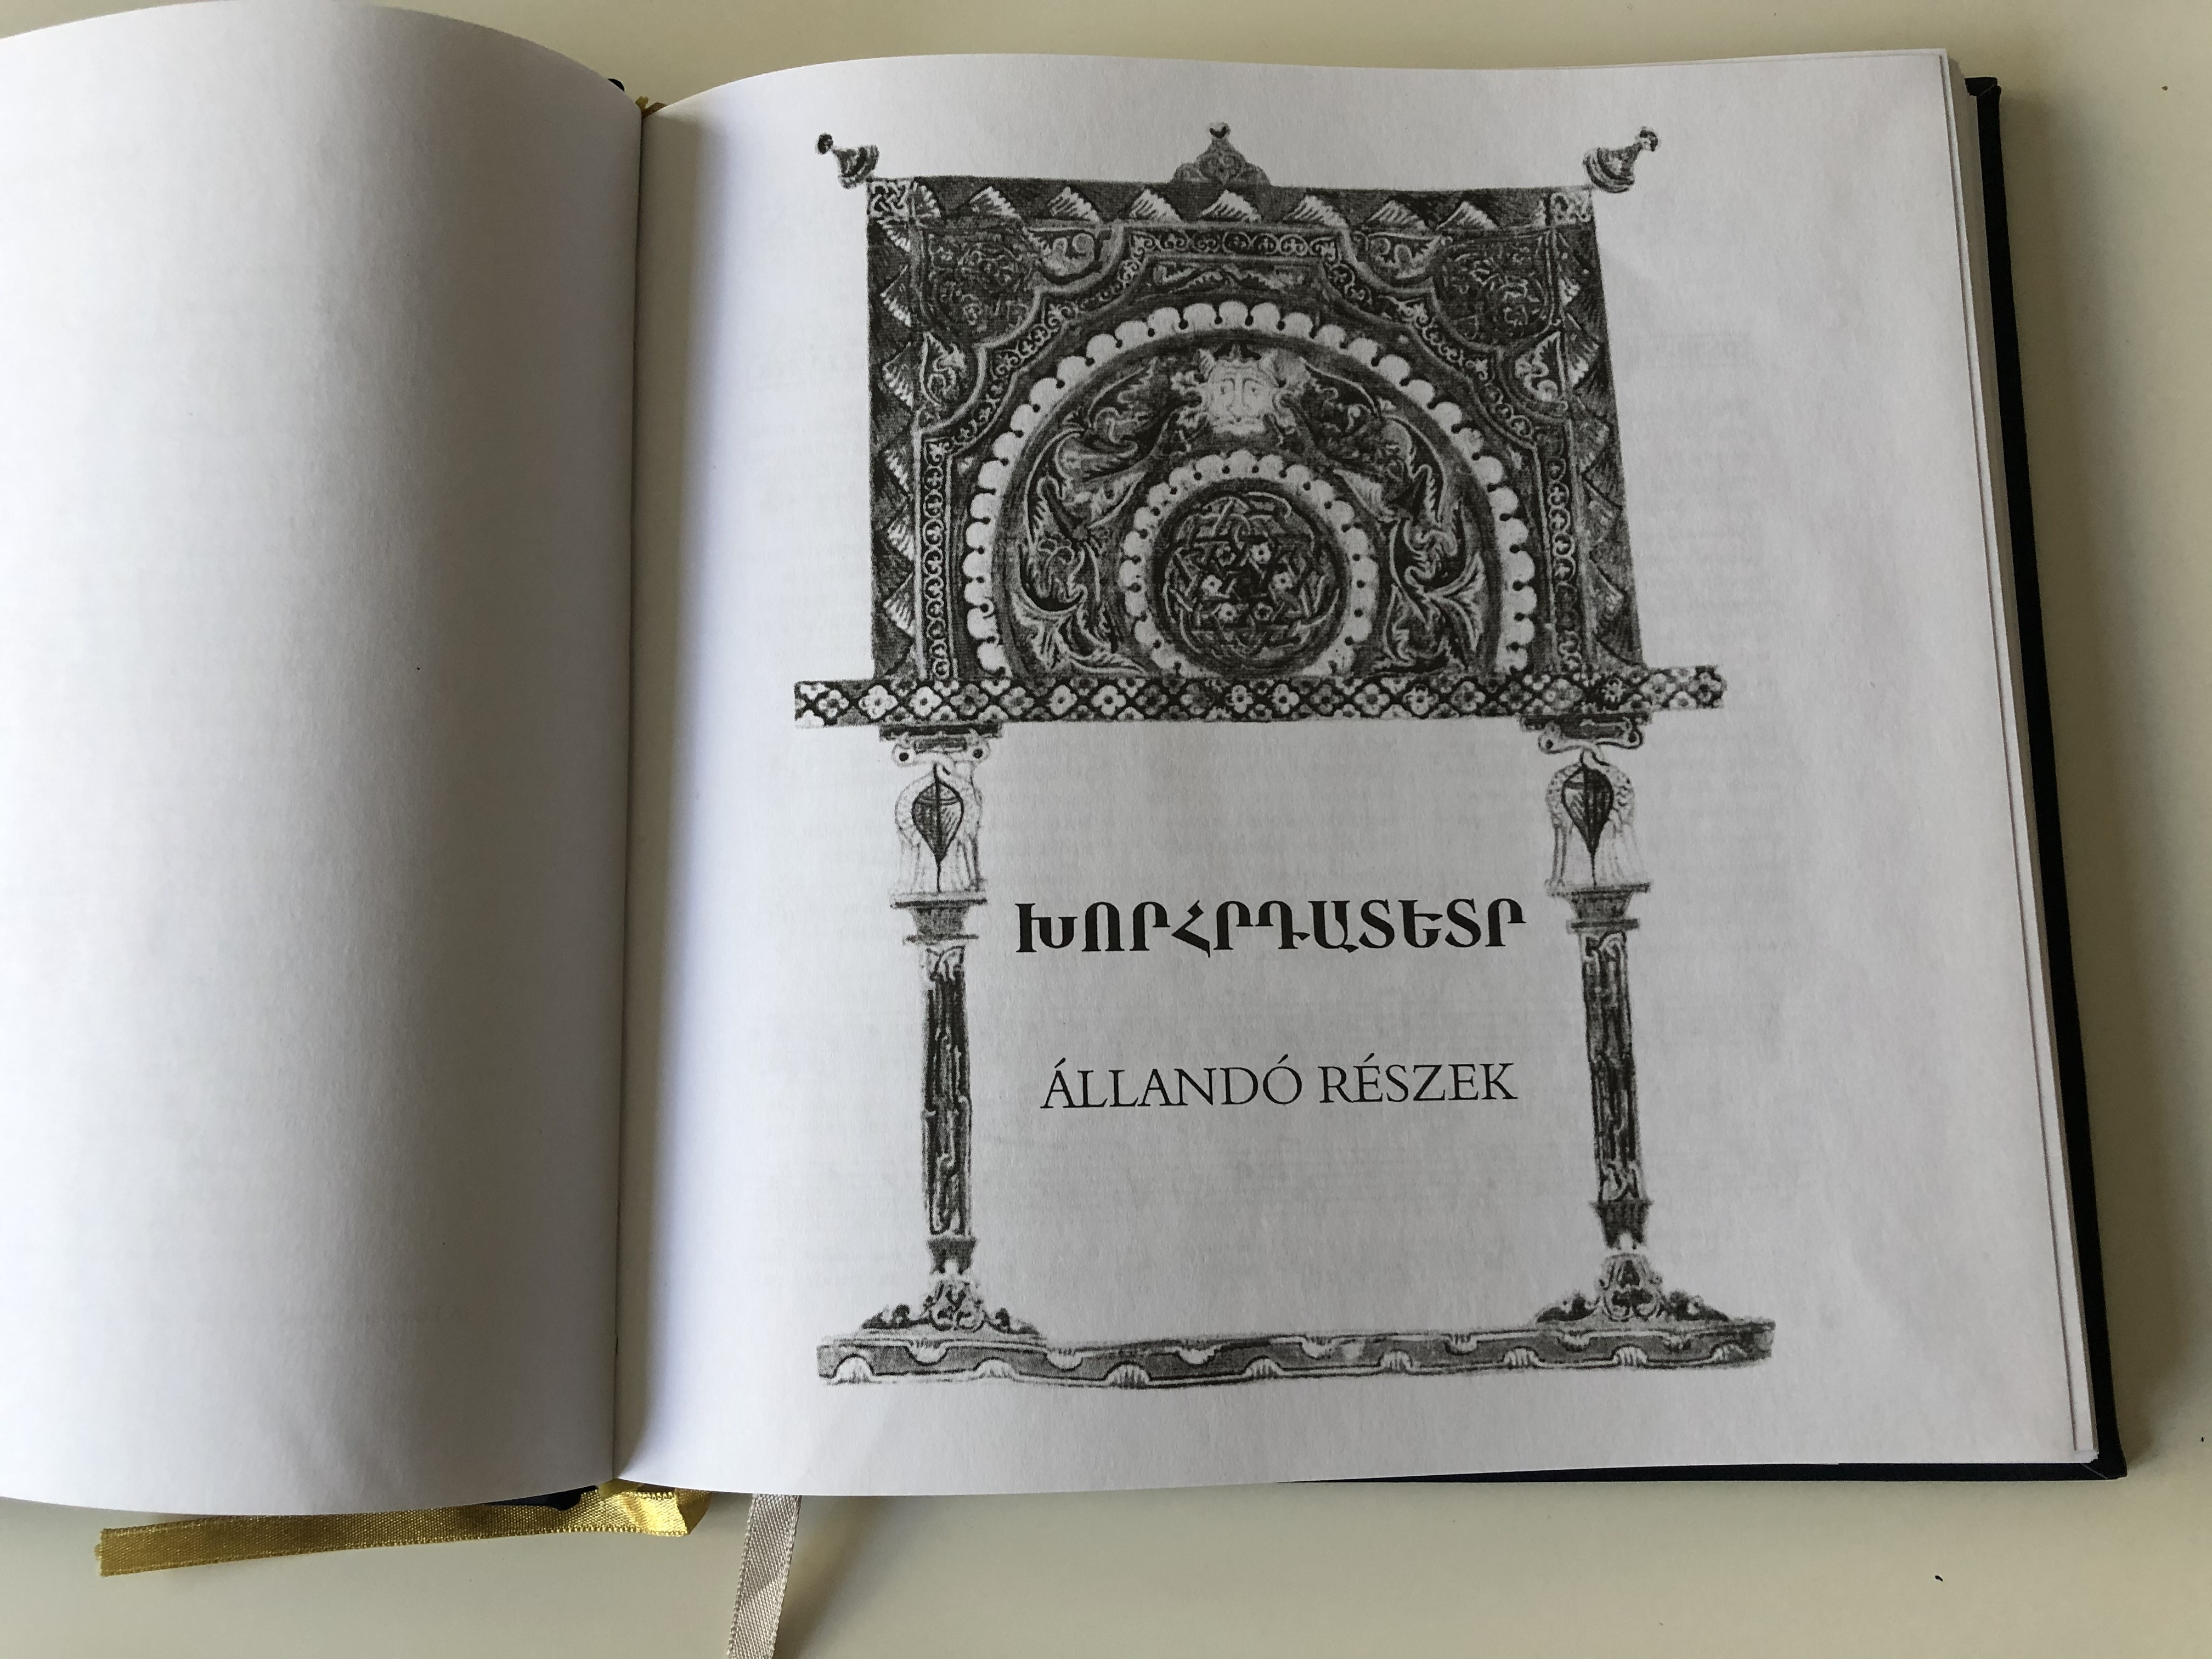 armenian-catholic-holy-liturgy-by-zsigmond-benedek-8.jpg